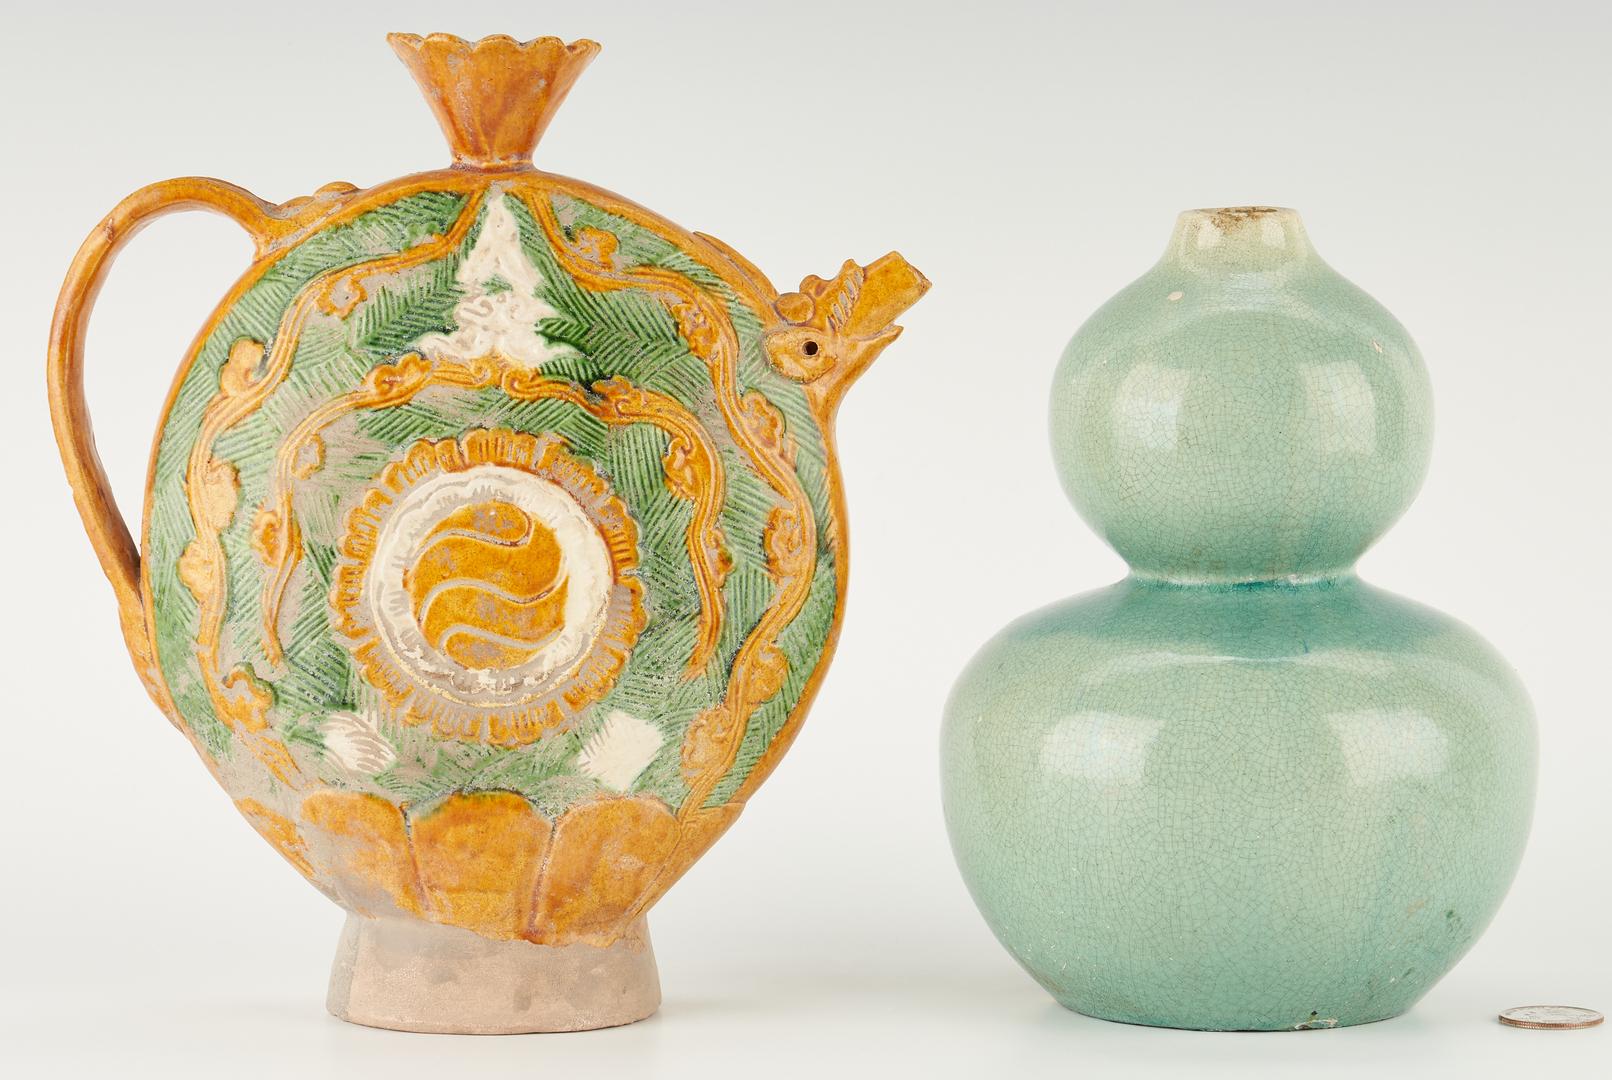 Lot 1174: Chinese Sancai Glaze Ewer & Double Gourd Celadon Vase